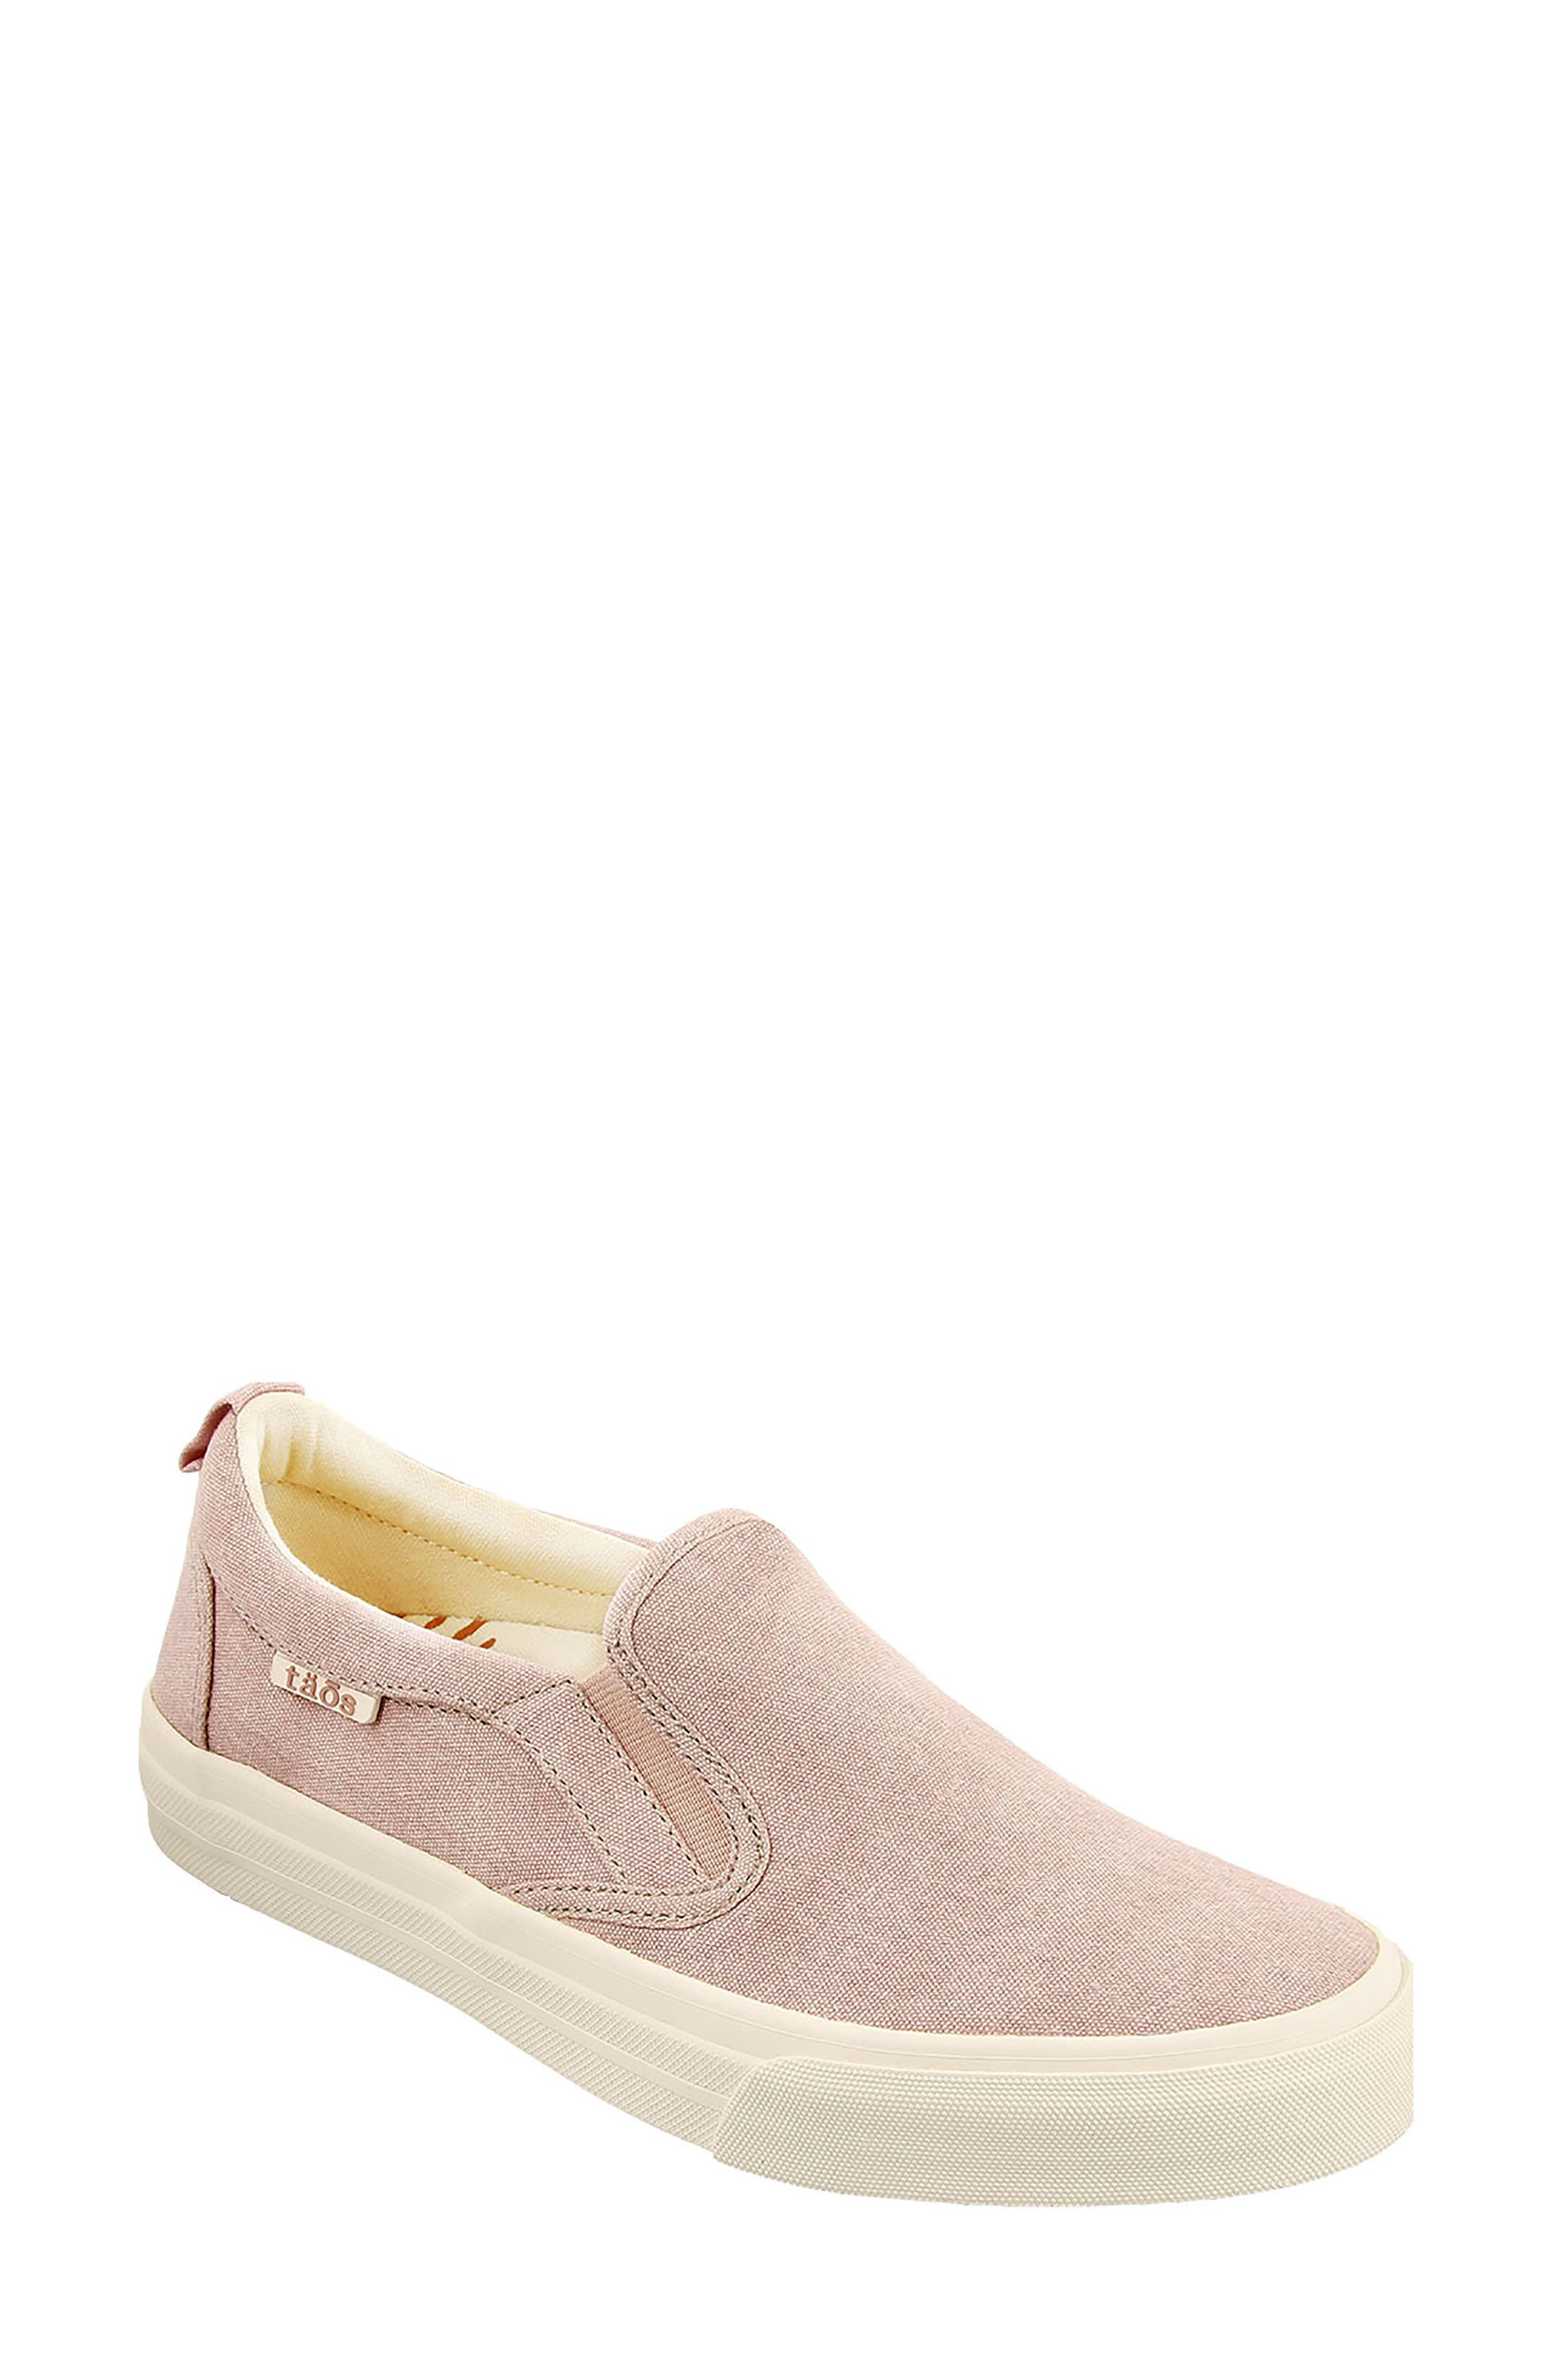 Soul Slip-On Sneaker,                             Main thumbnail 1, color,                             Pink Wash Canvas